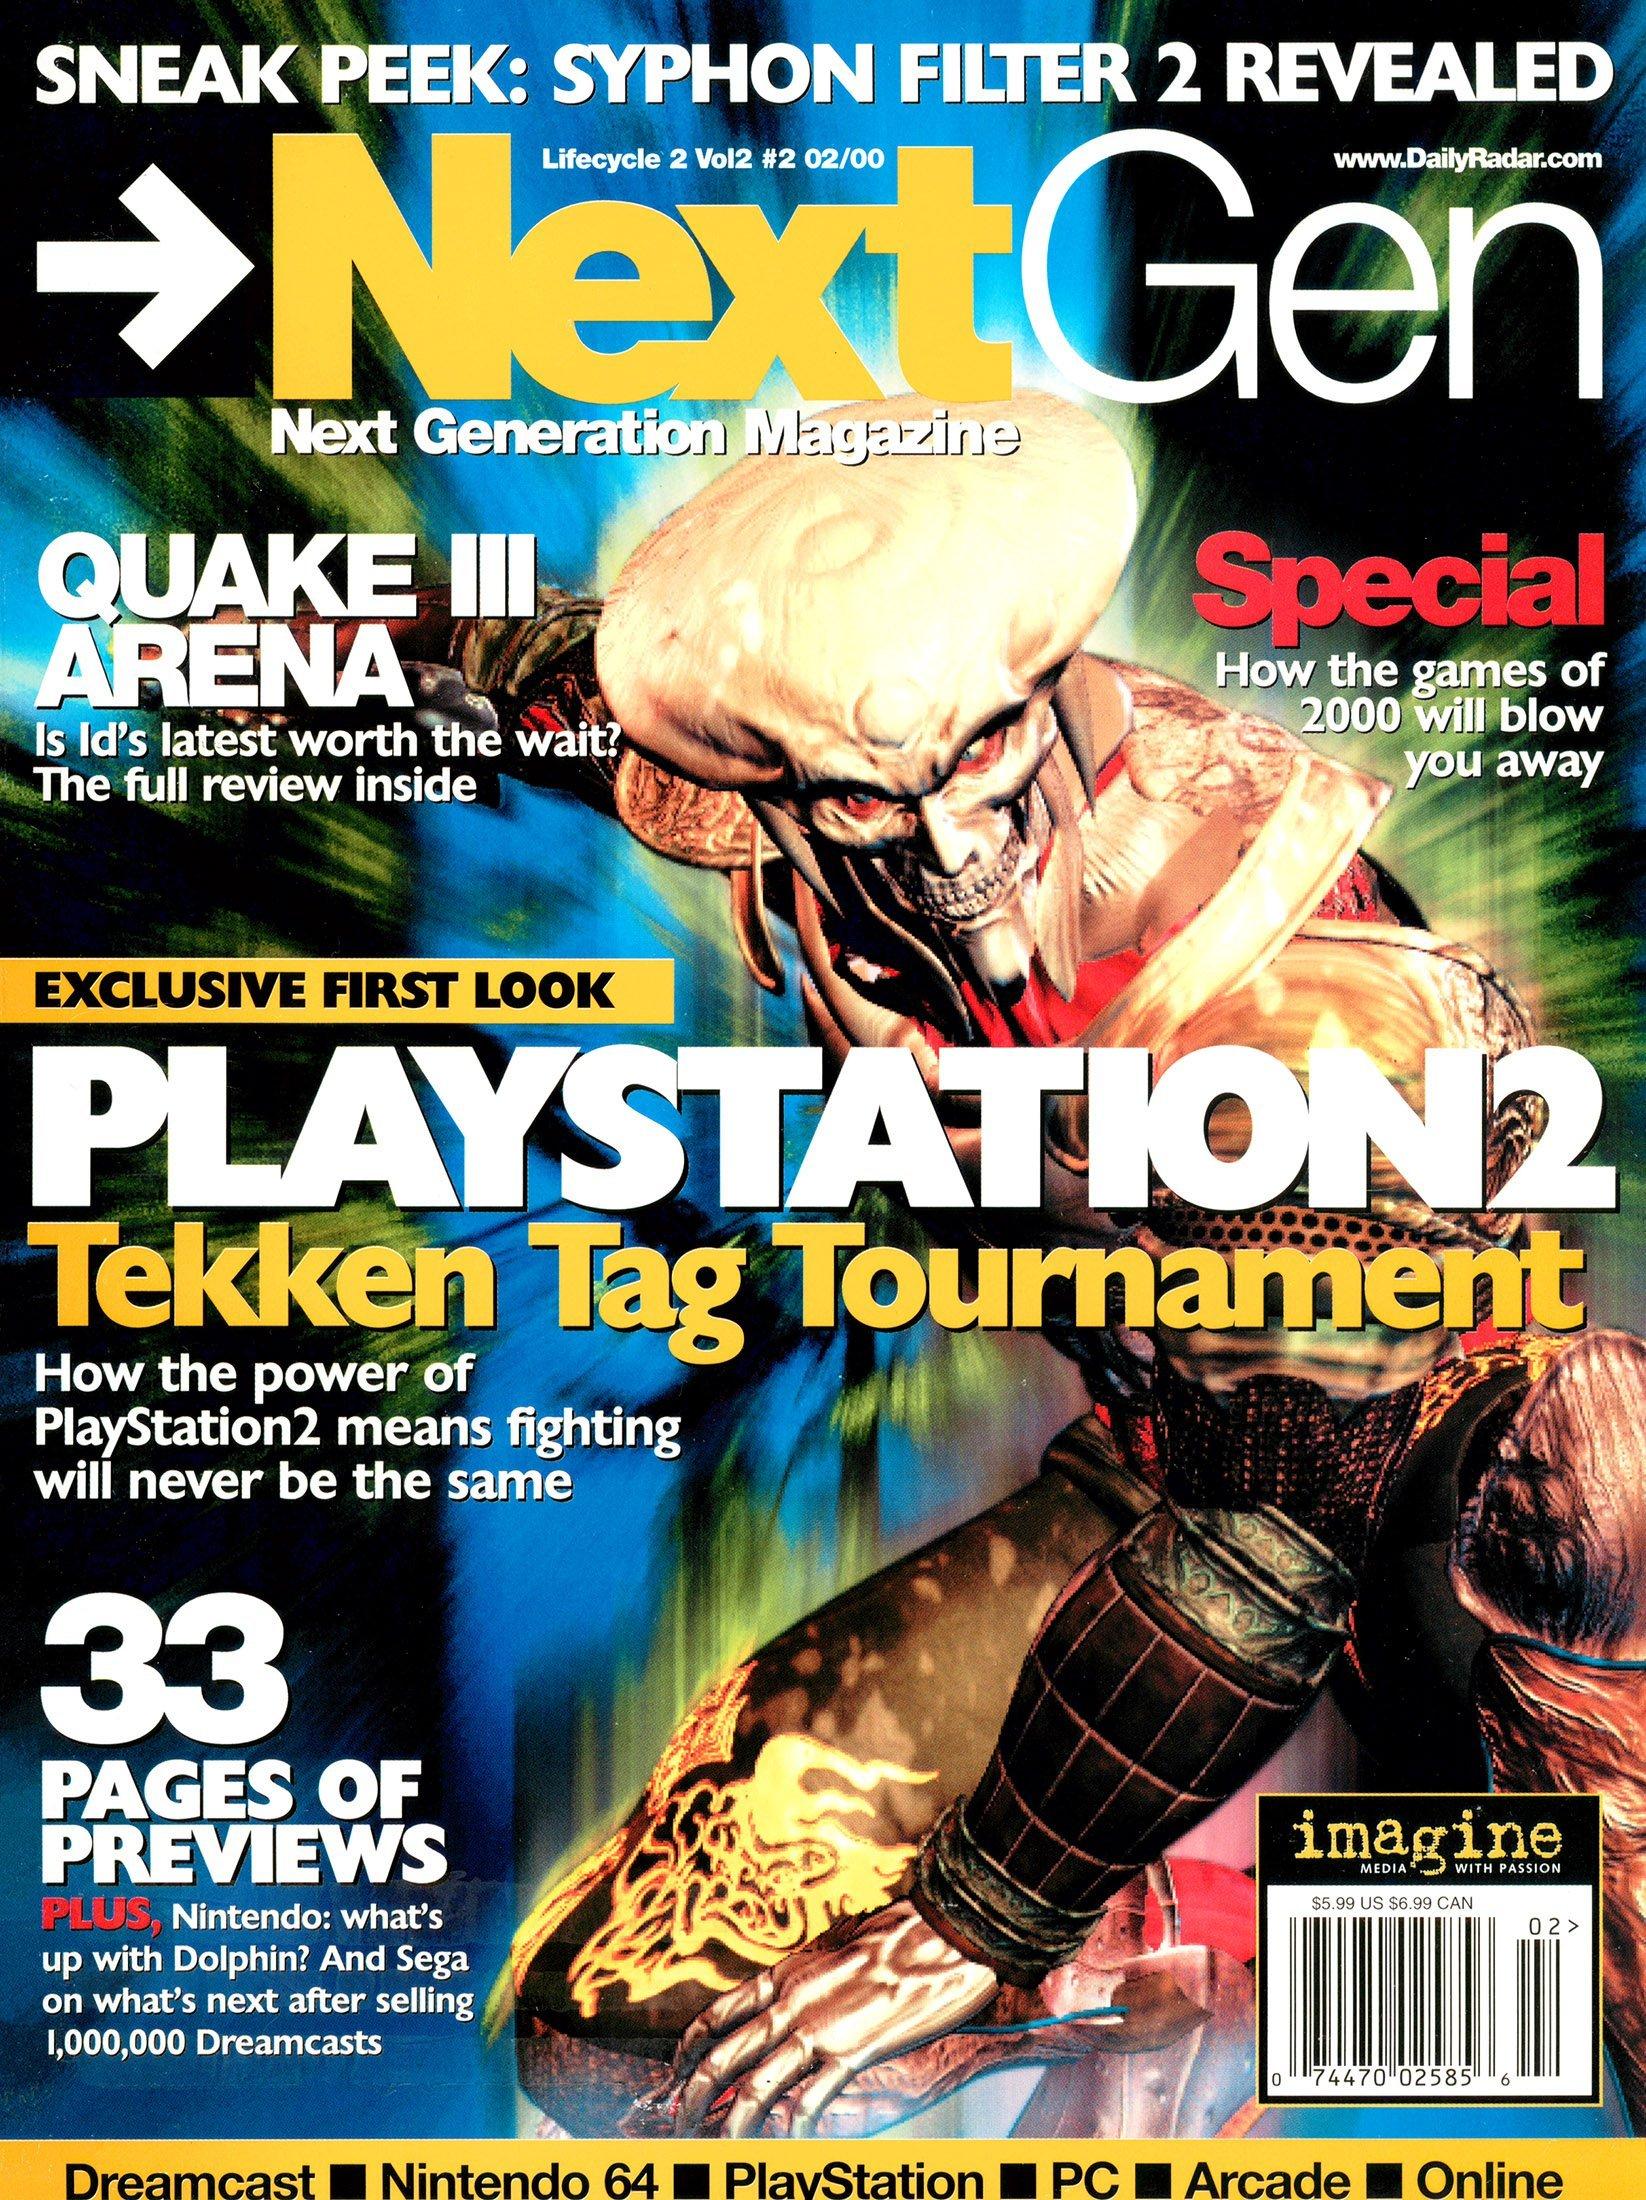 Next Generation Issue 62 February 2000